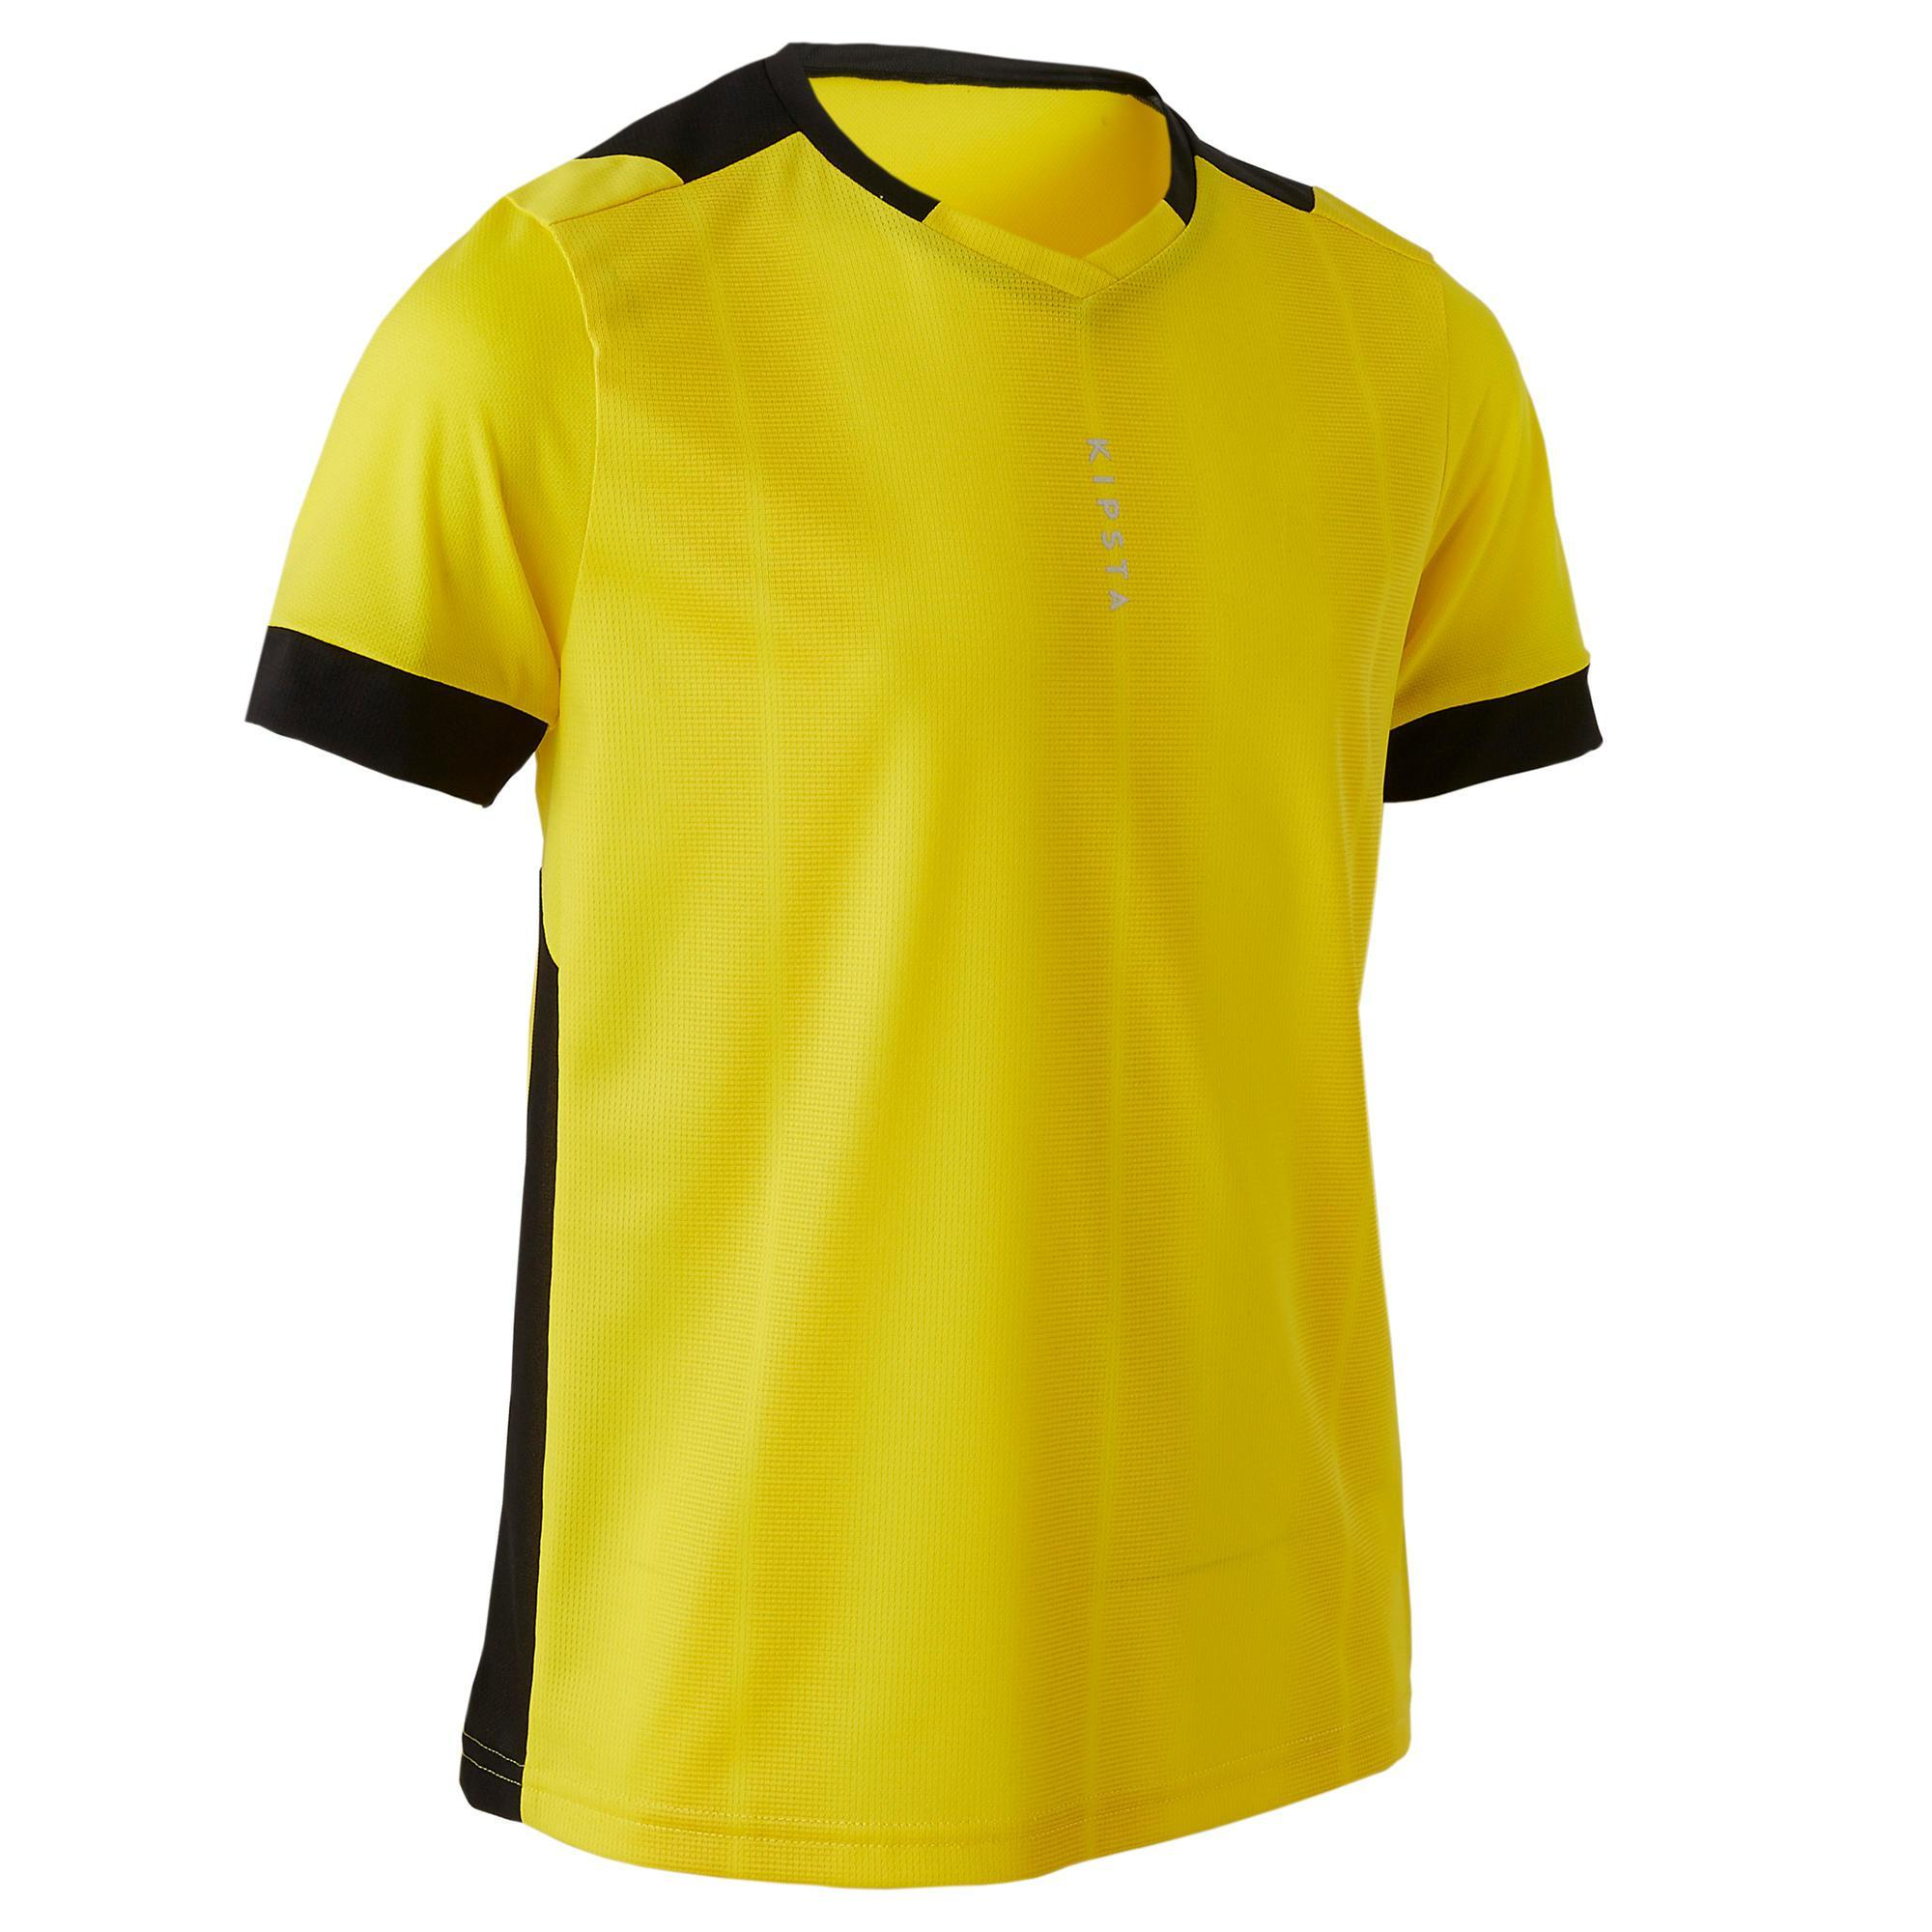 Kipsta Voetbalshirt kind F500 geel/zwart